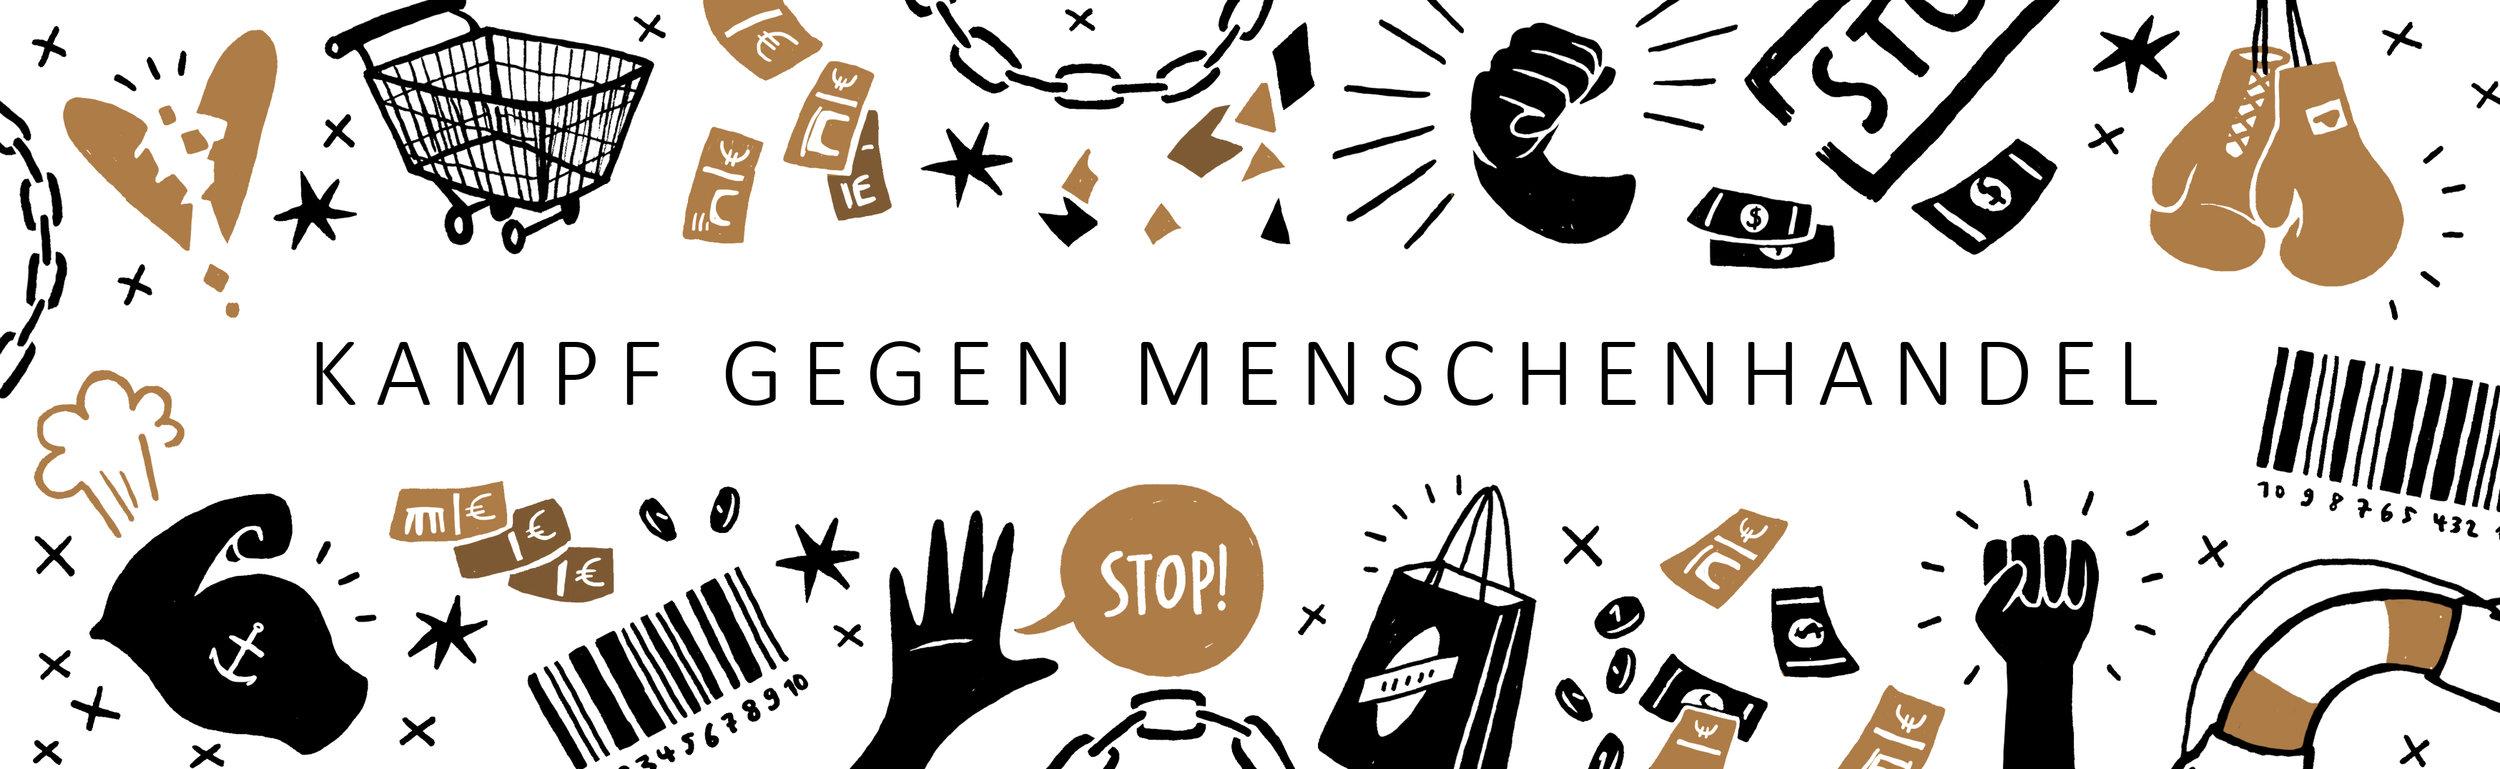 Banner_KampfMenschenhandel.jpg